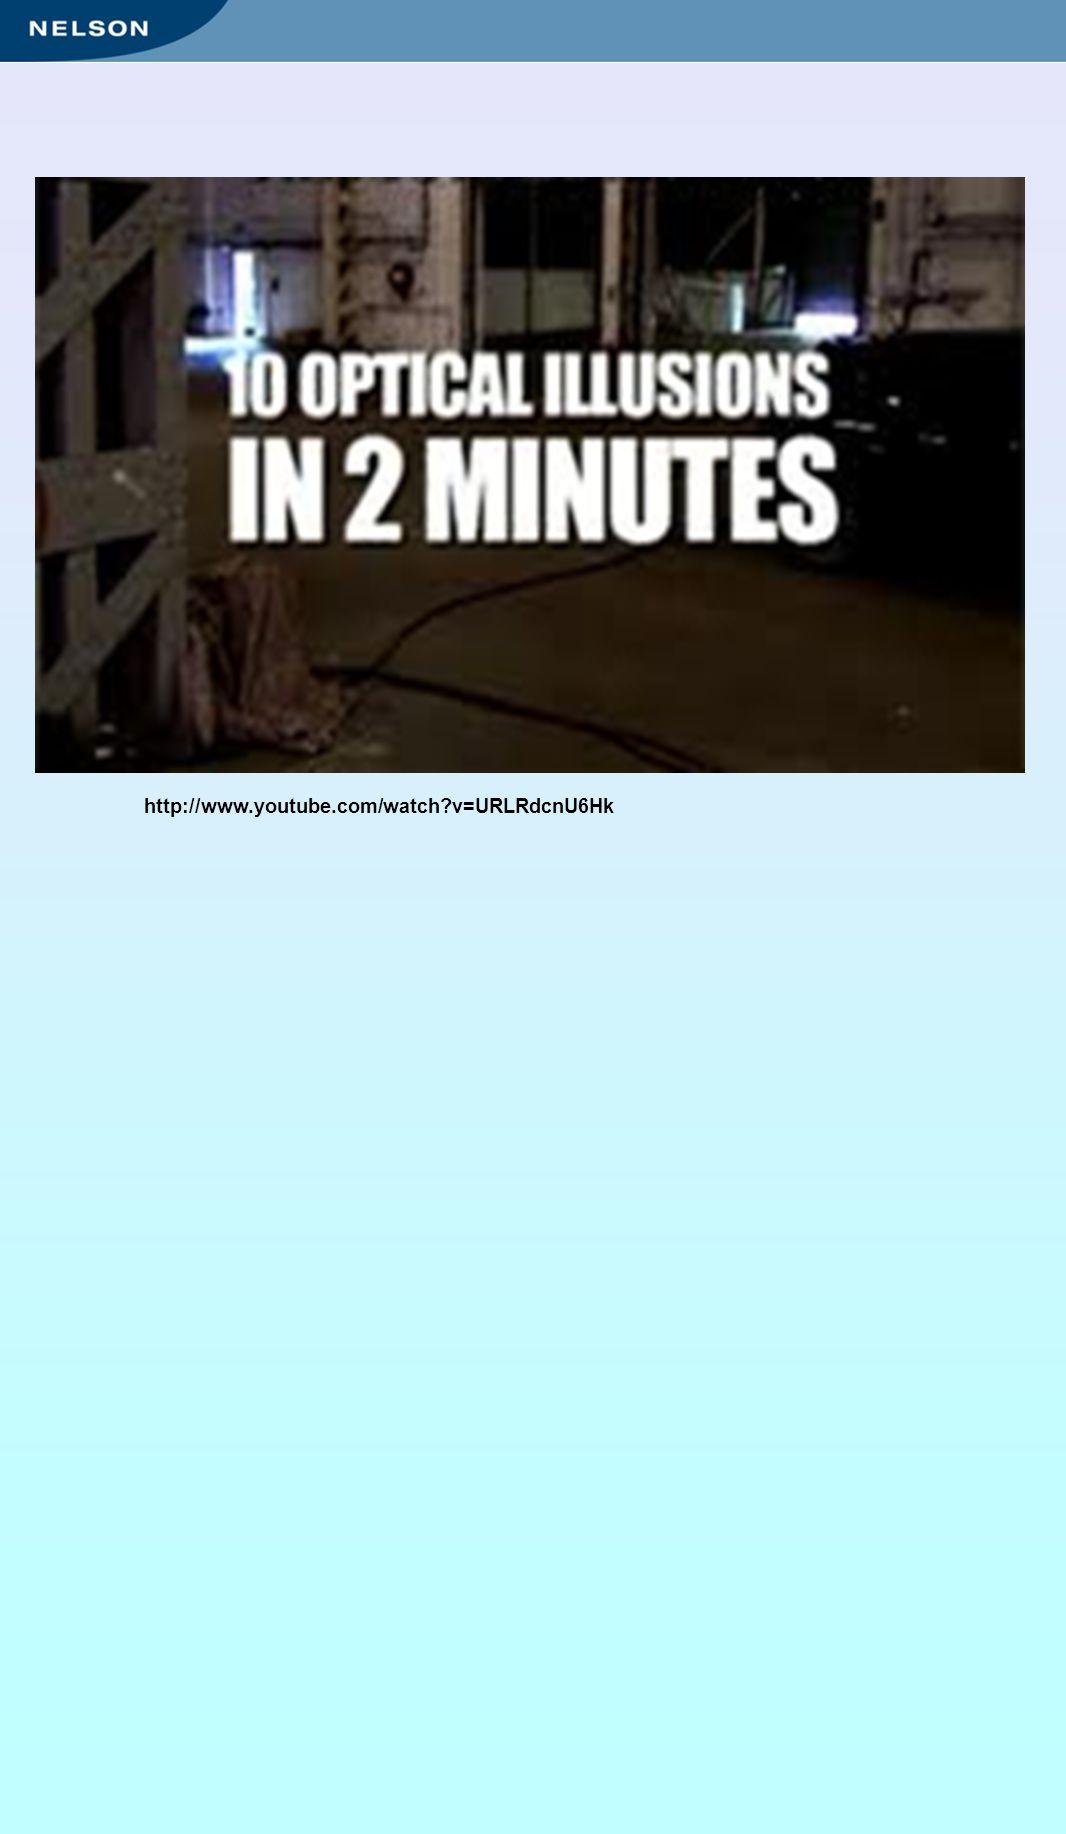 http://www.youtube.com/watch v=URLRdcnU6Hk